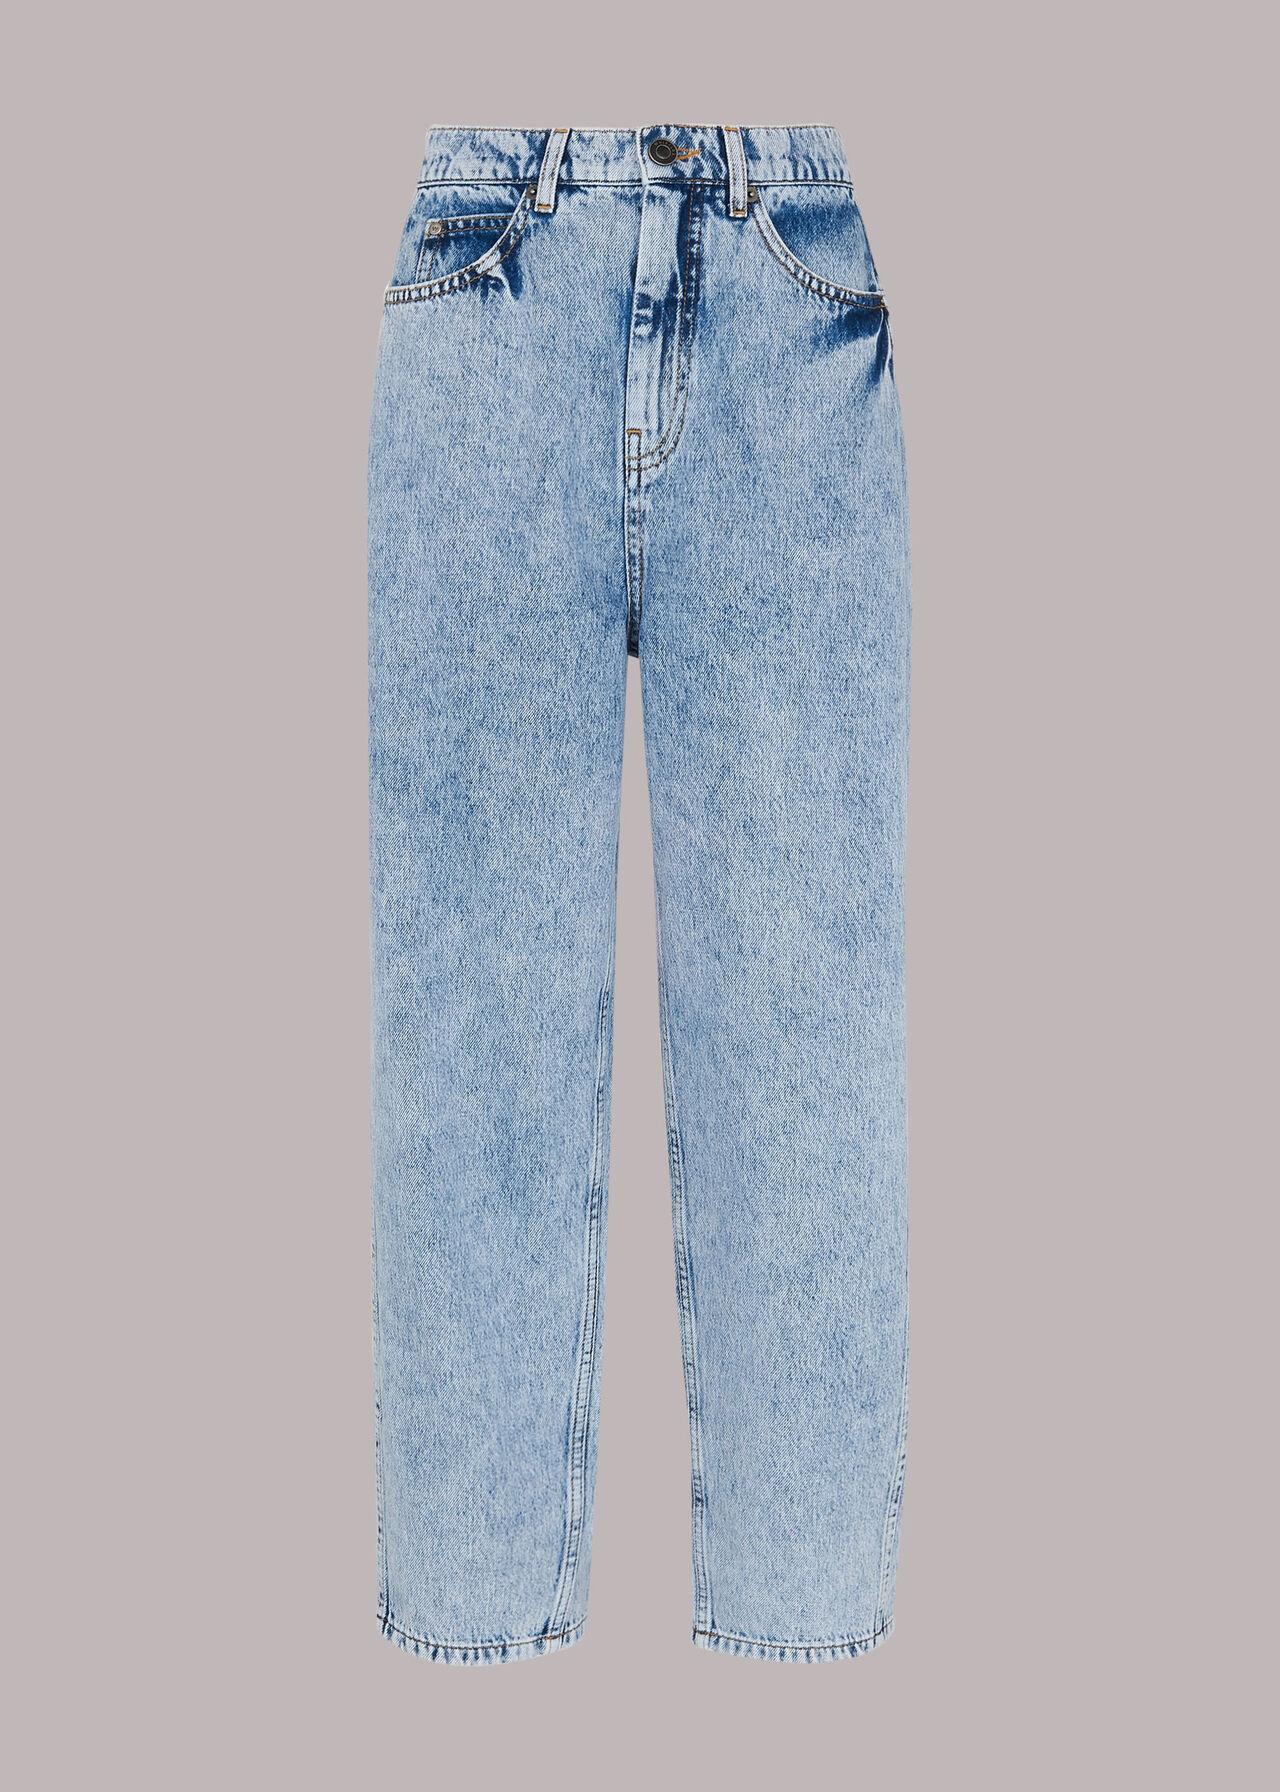 Authentic Acid Barrel Leg Jean